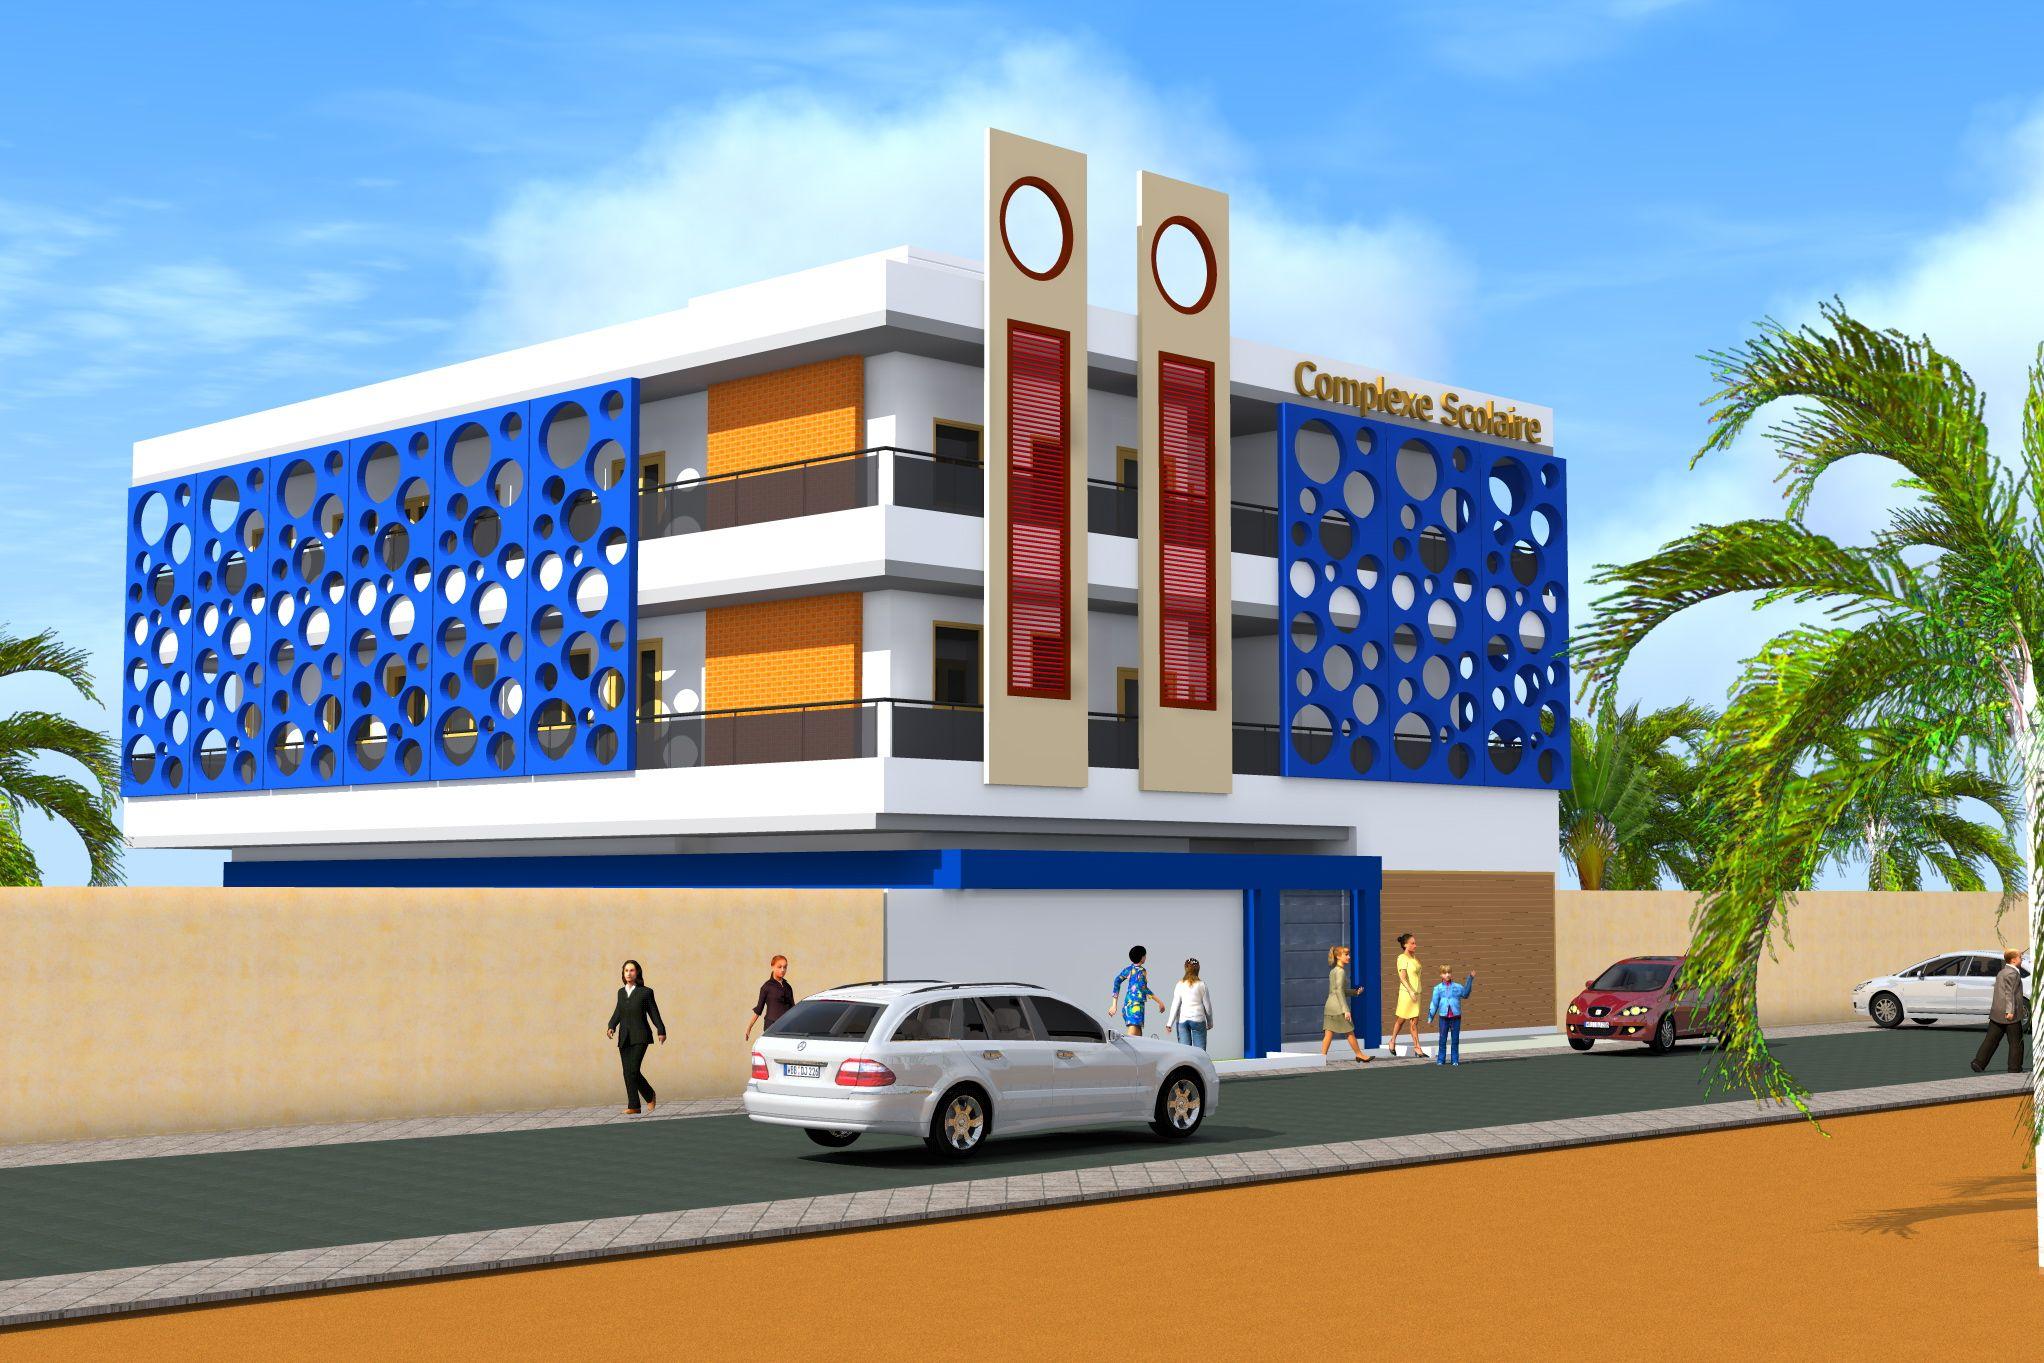 architecture et design a ouagadougou burkina faso. Black Bedroom Furniture Sets. Home Design Ideas